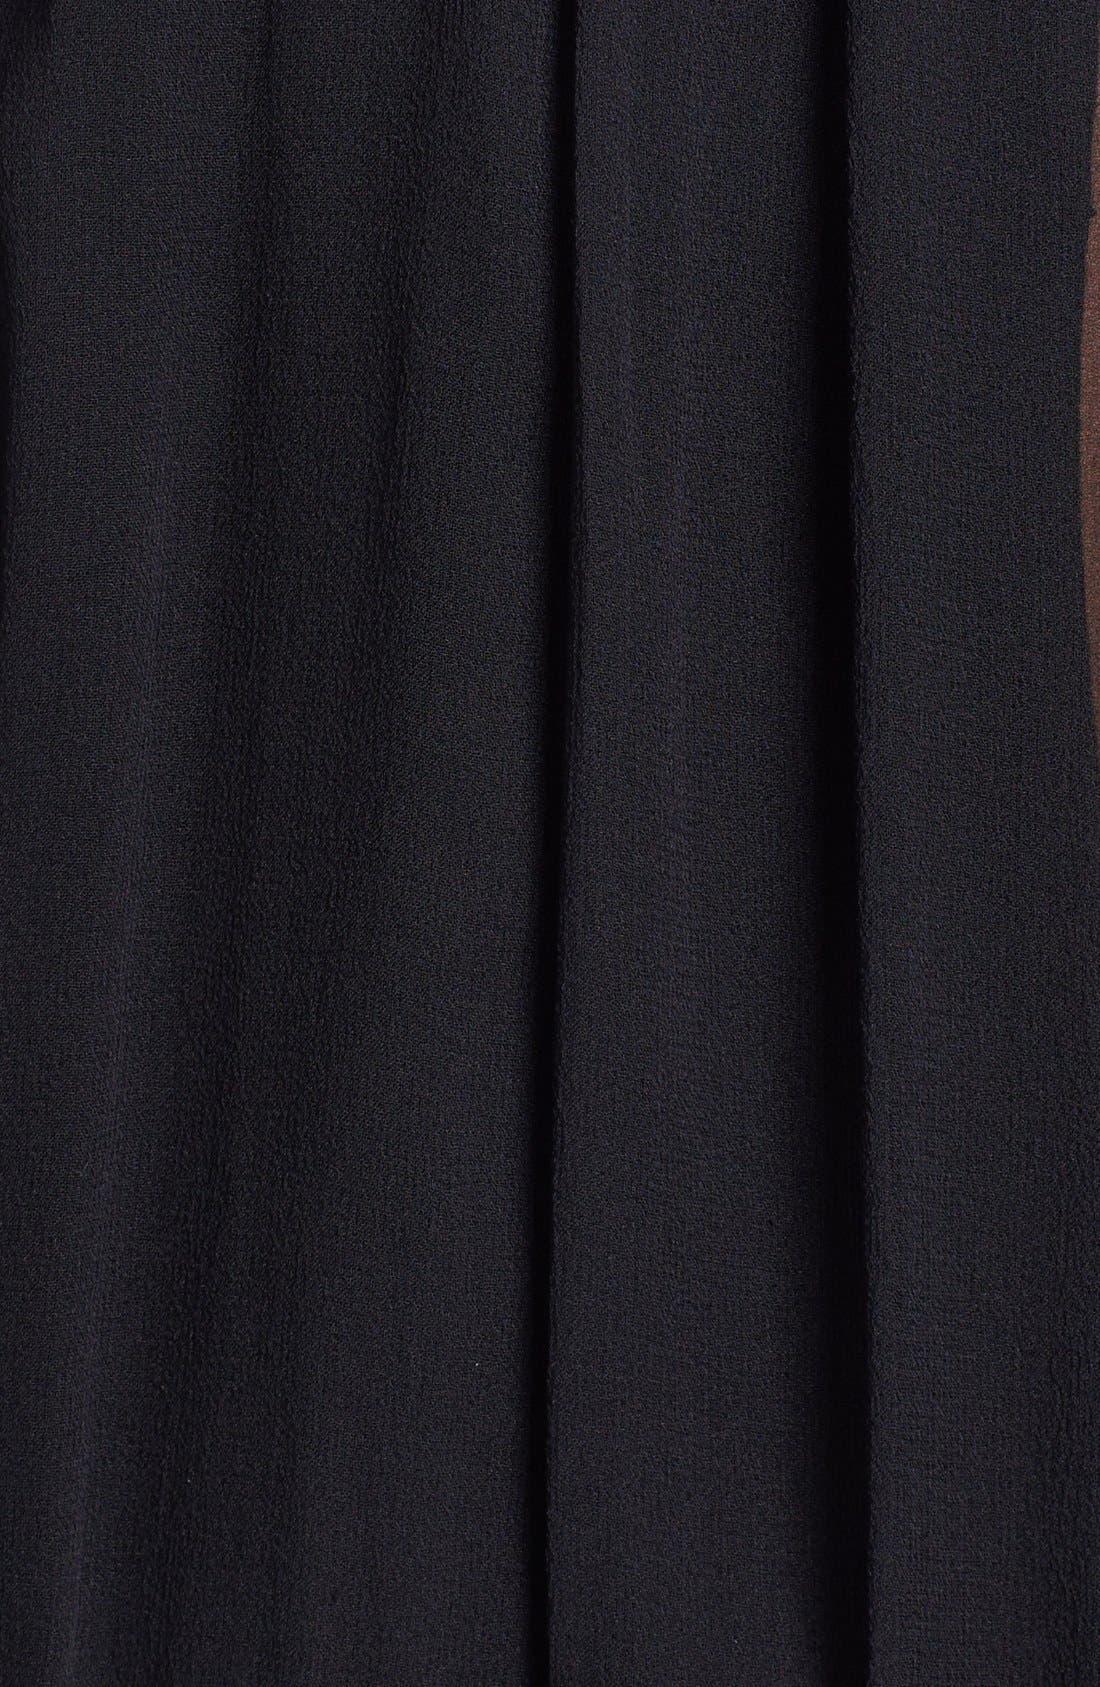 Alternate Image 3  - Trina Turk 'Lillia' Jersey Jumpsuit